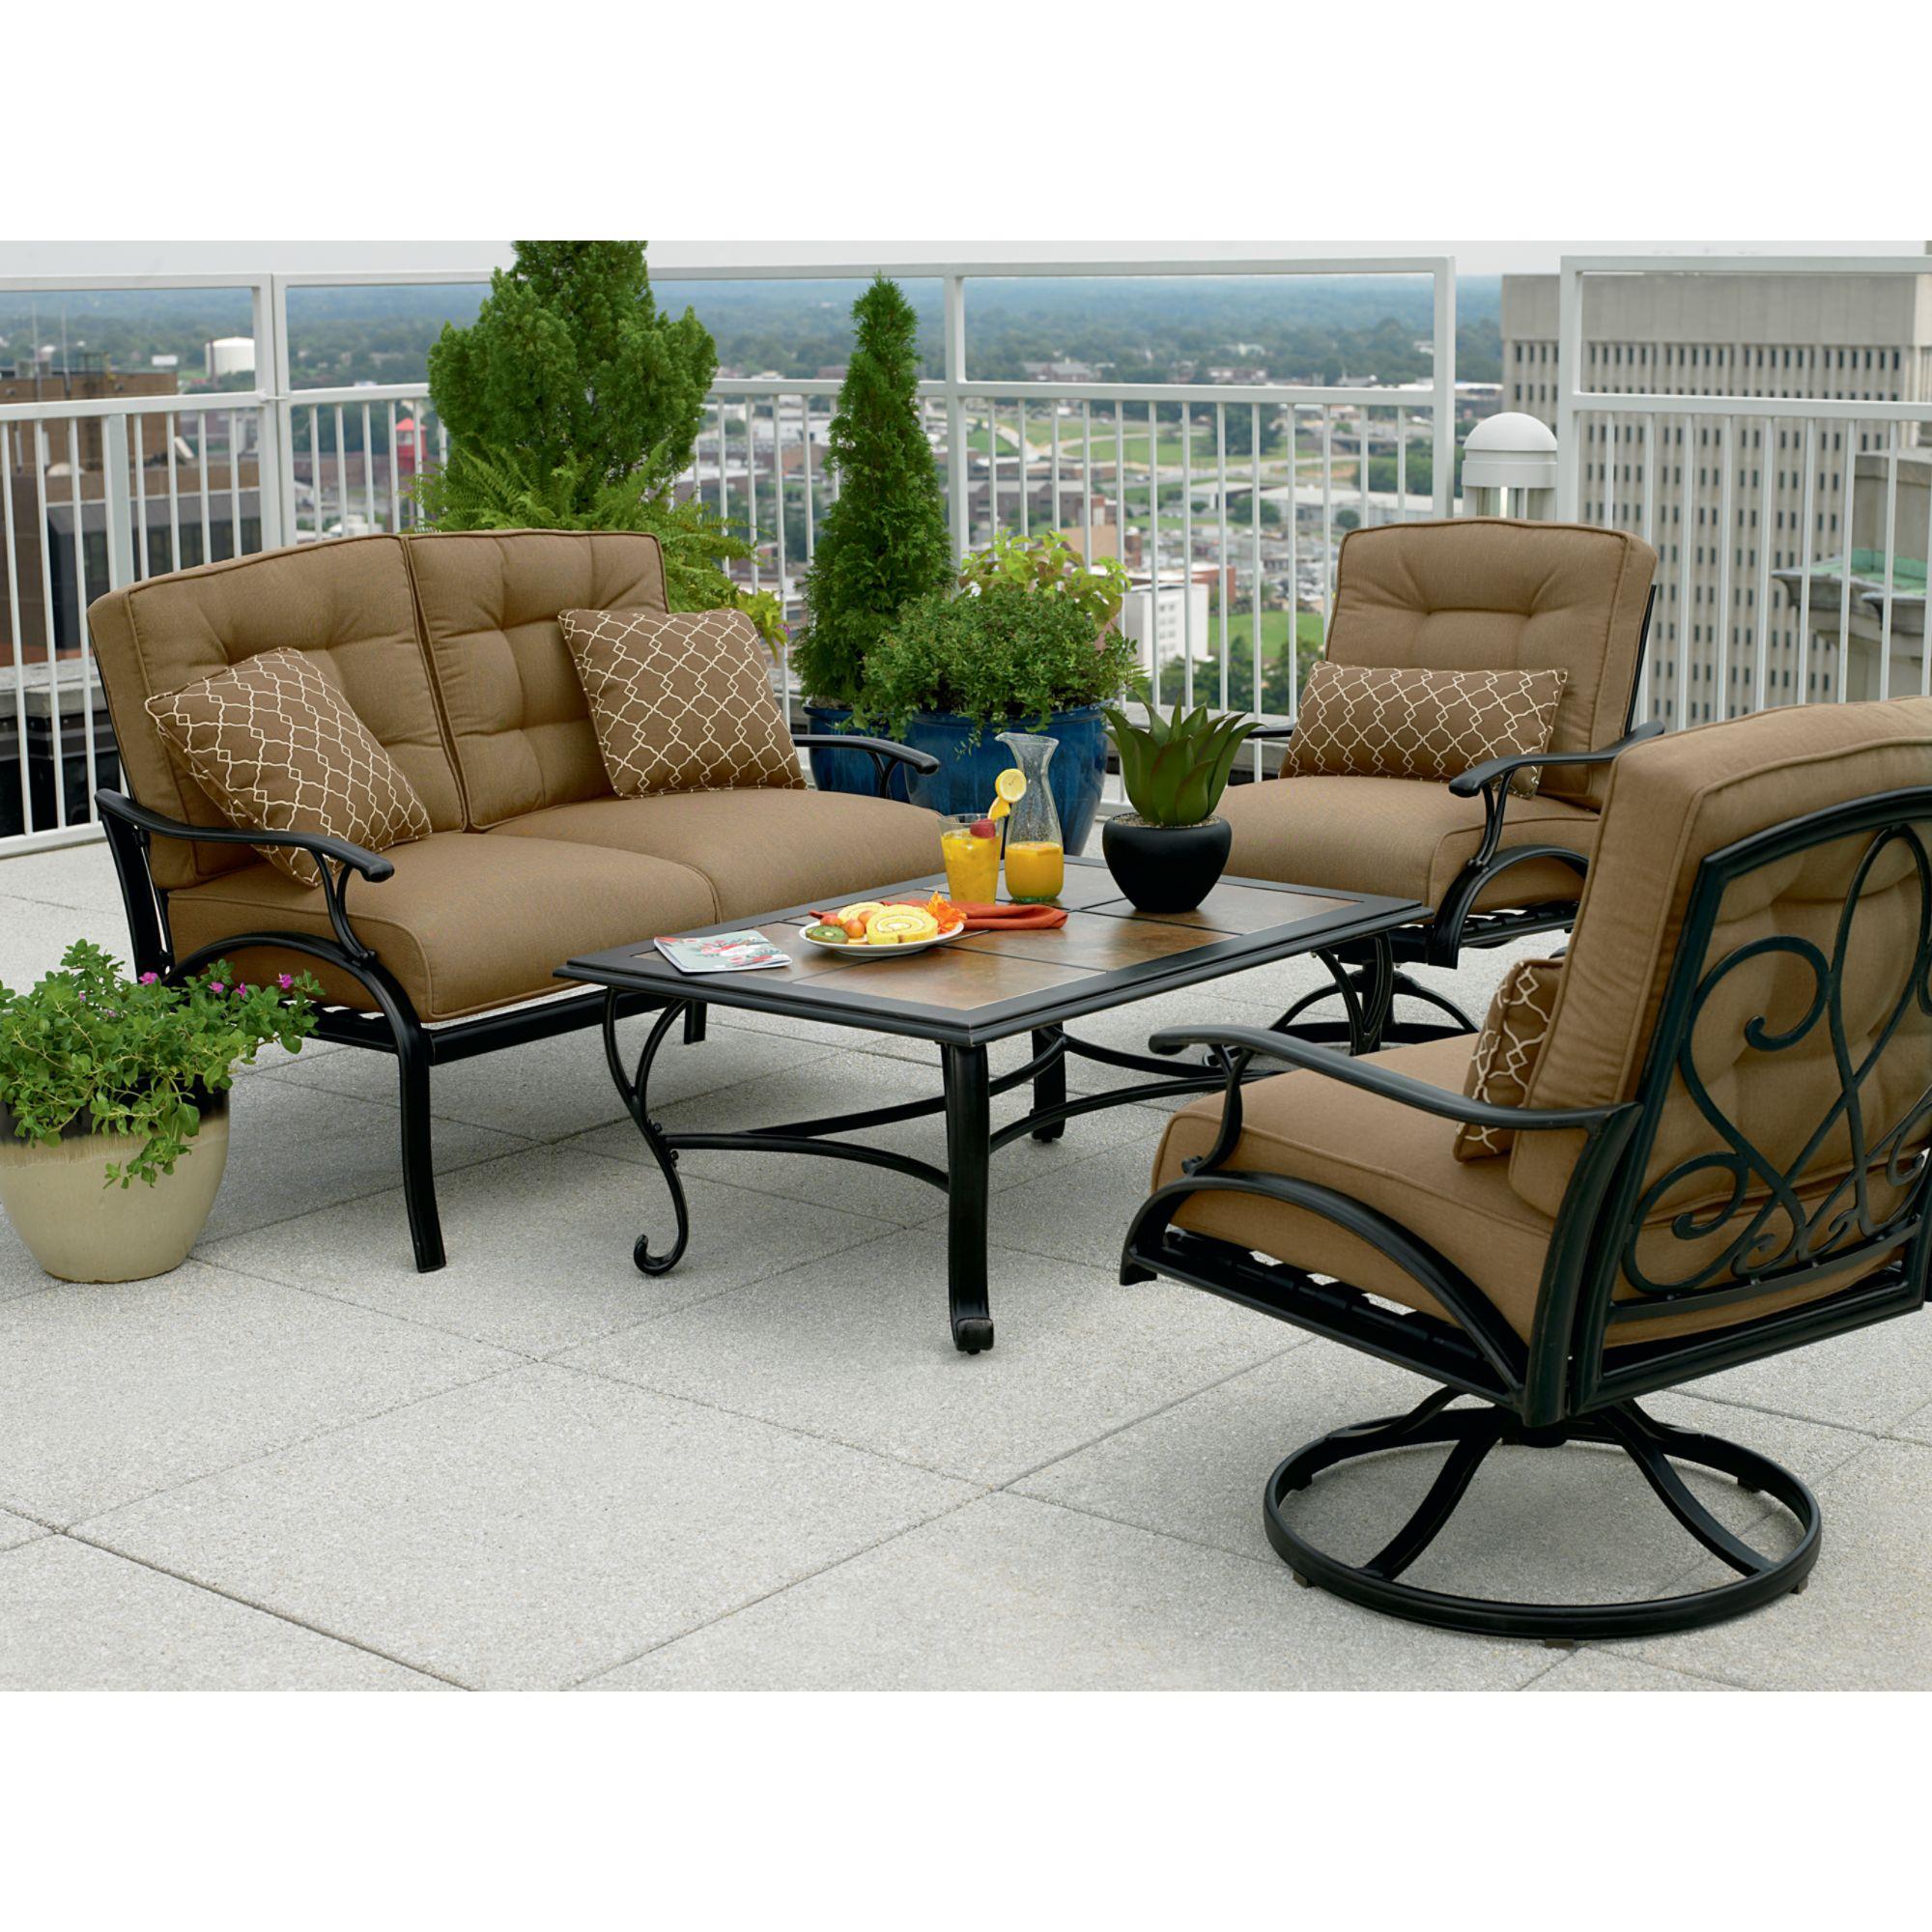 La-boy Outdoor Caitlyn 4 Pc. Seating Set